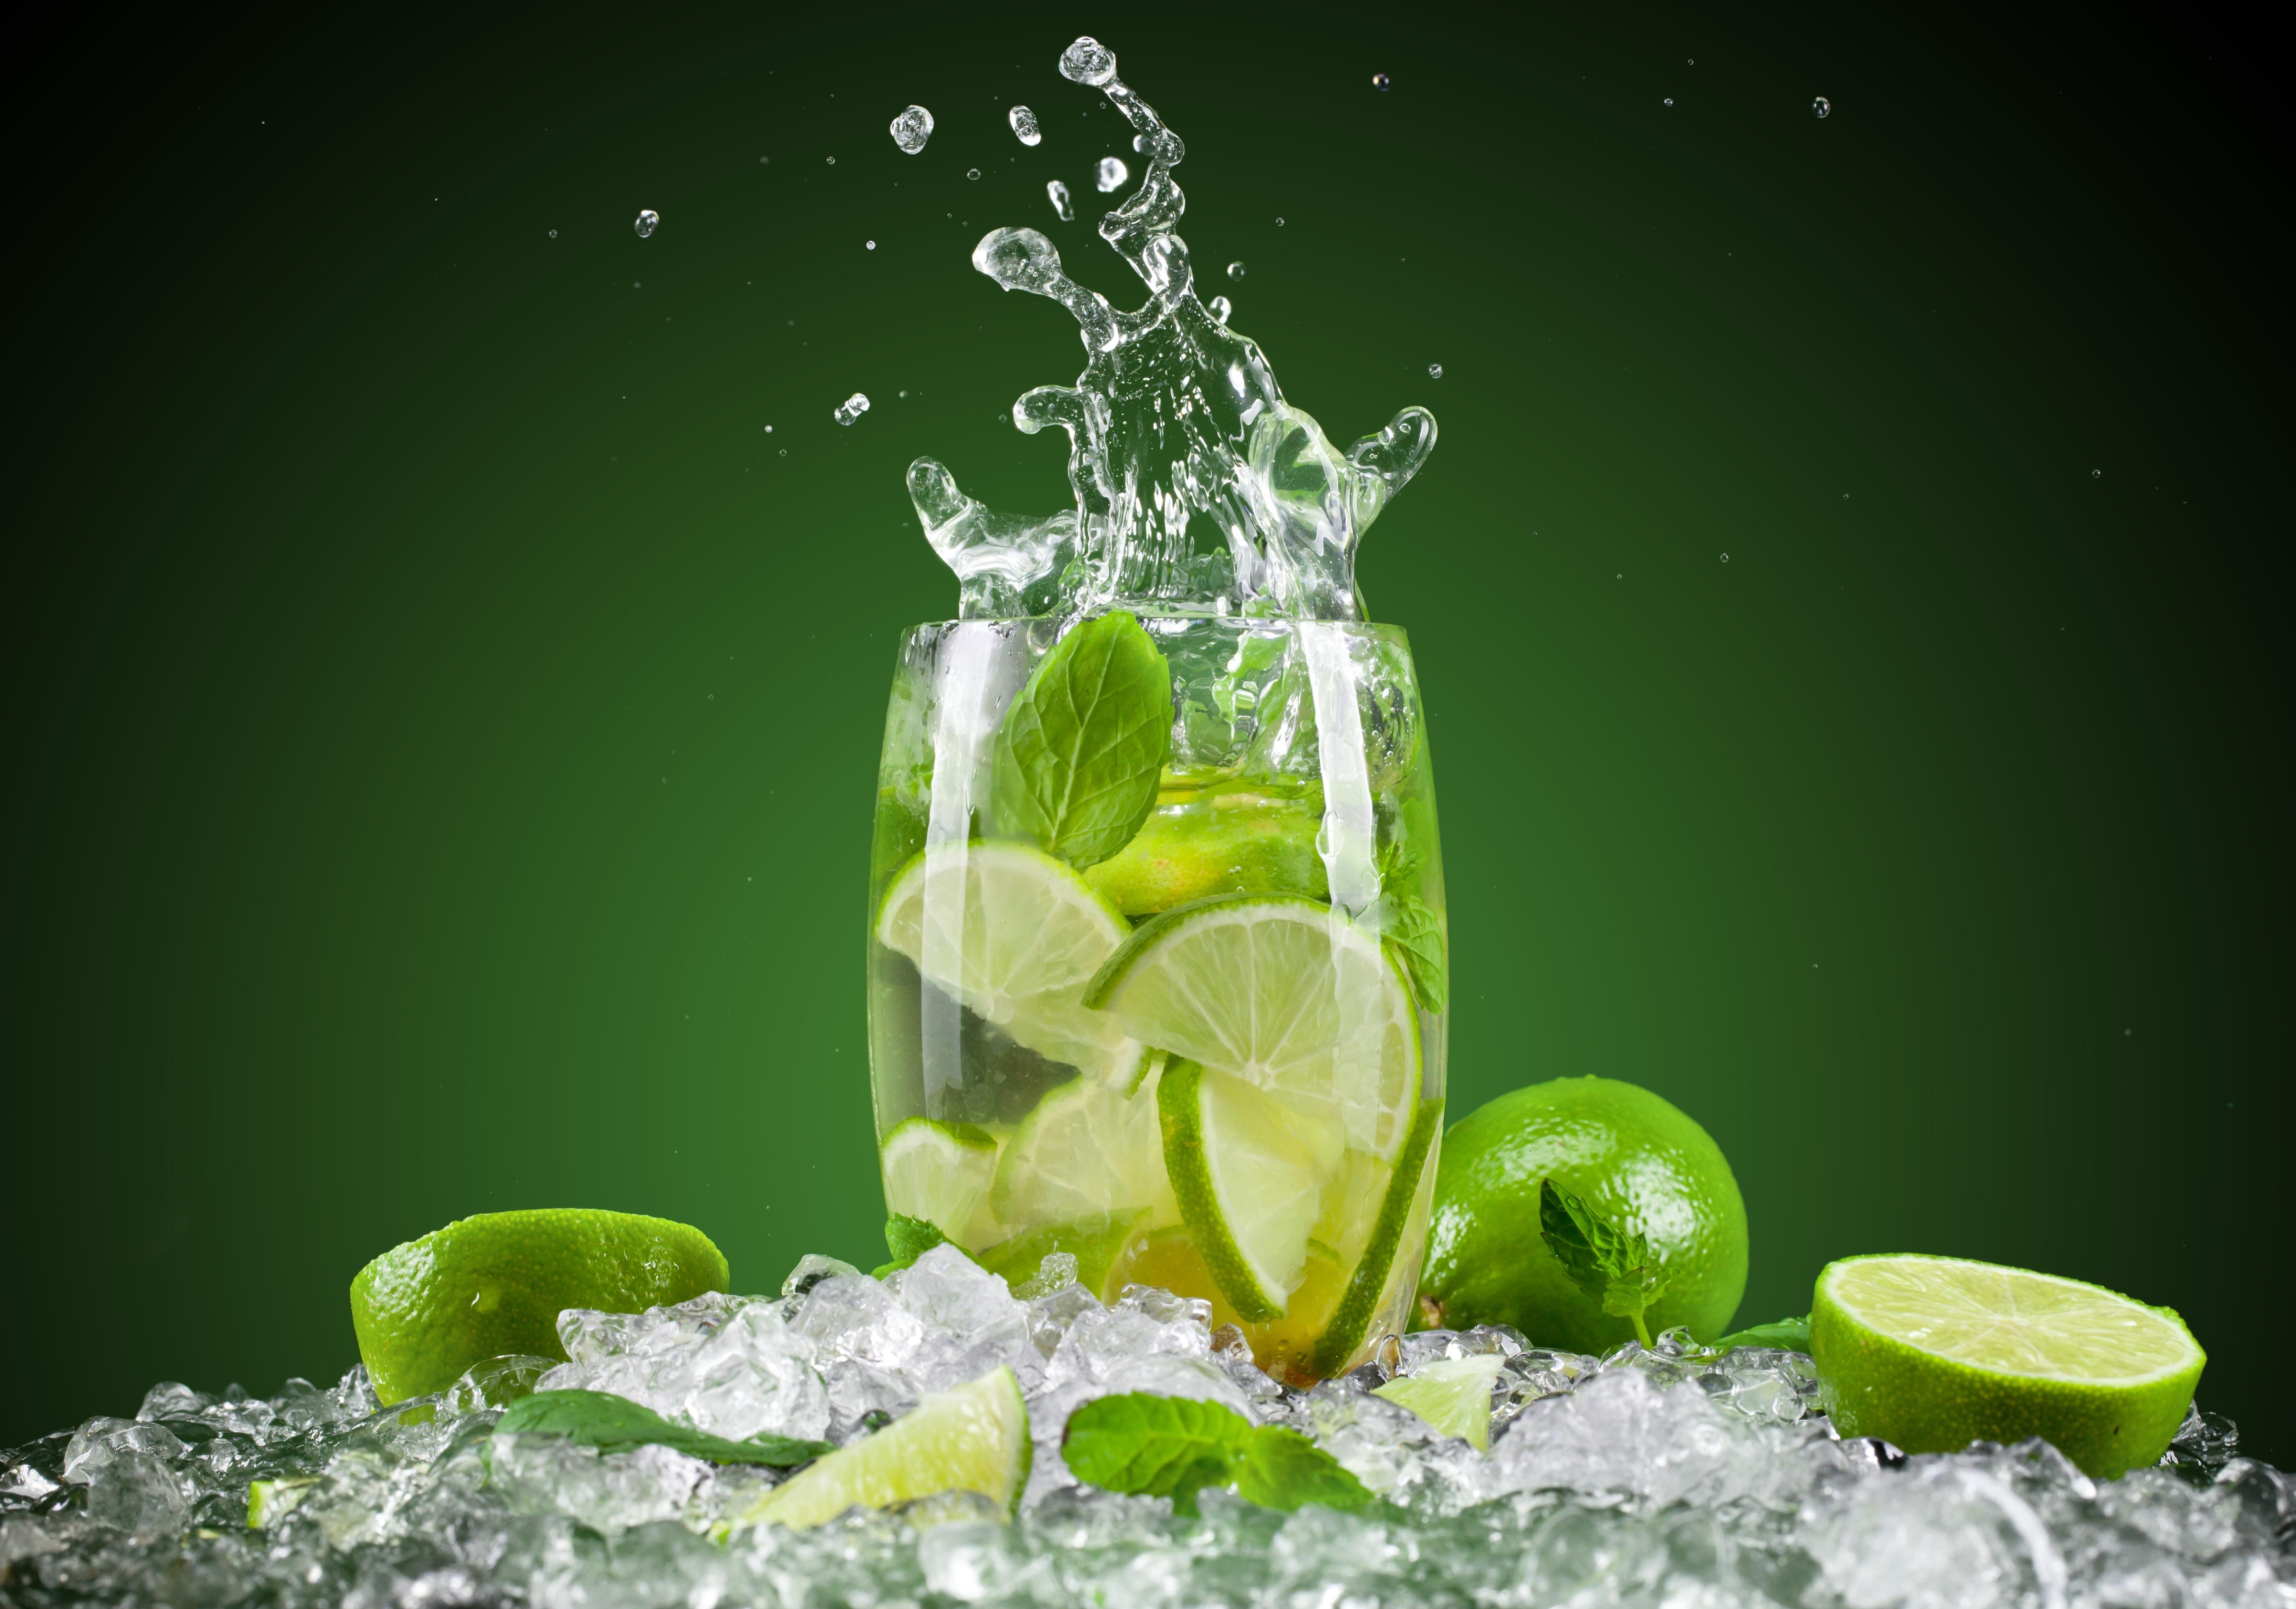 fruit lemon juice fresh cocktail ice green hd wallpaper splash 5463x3829